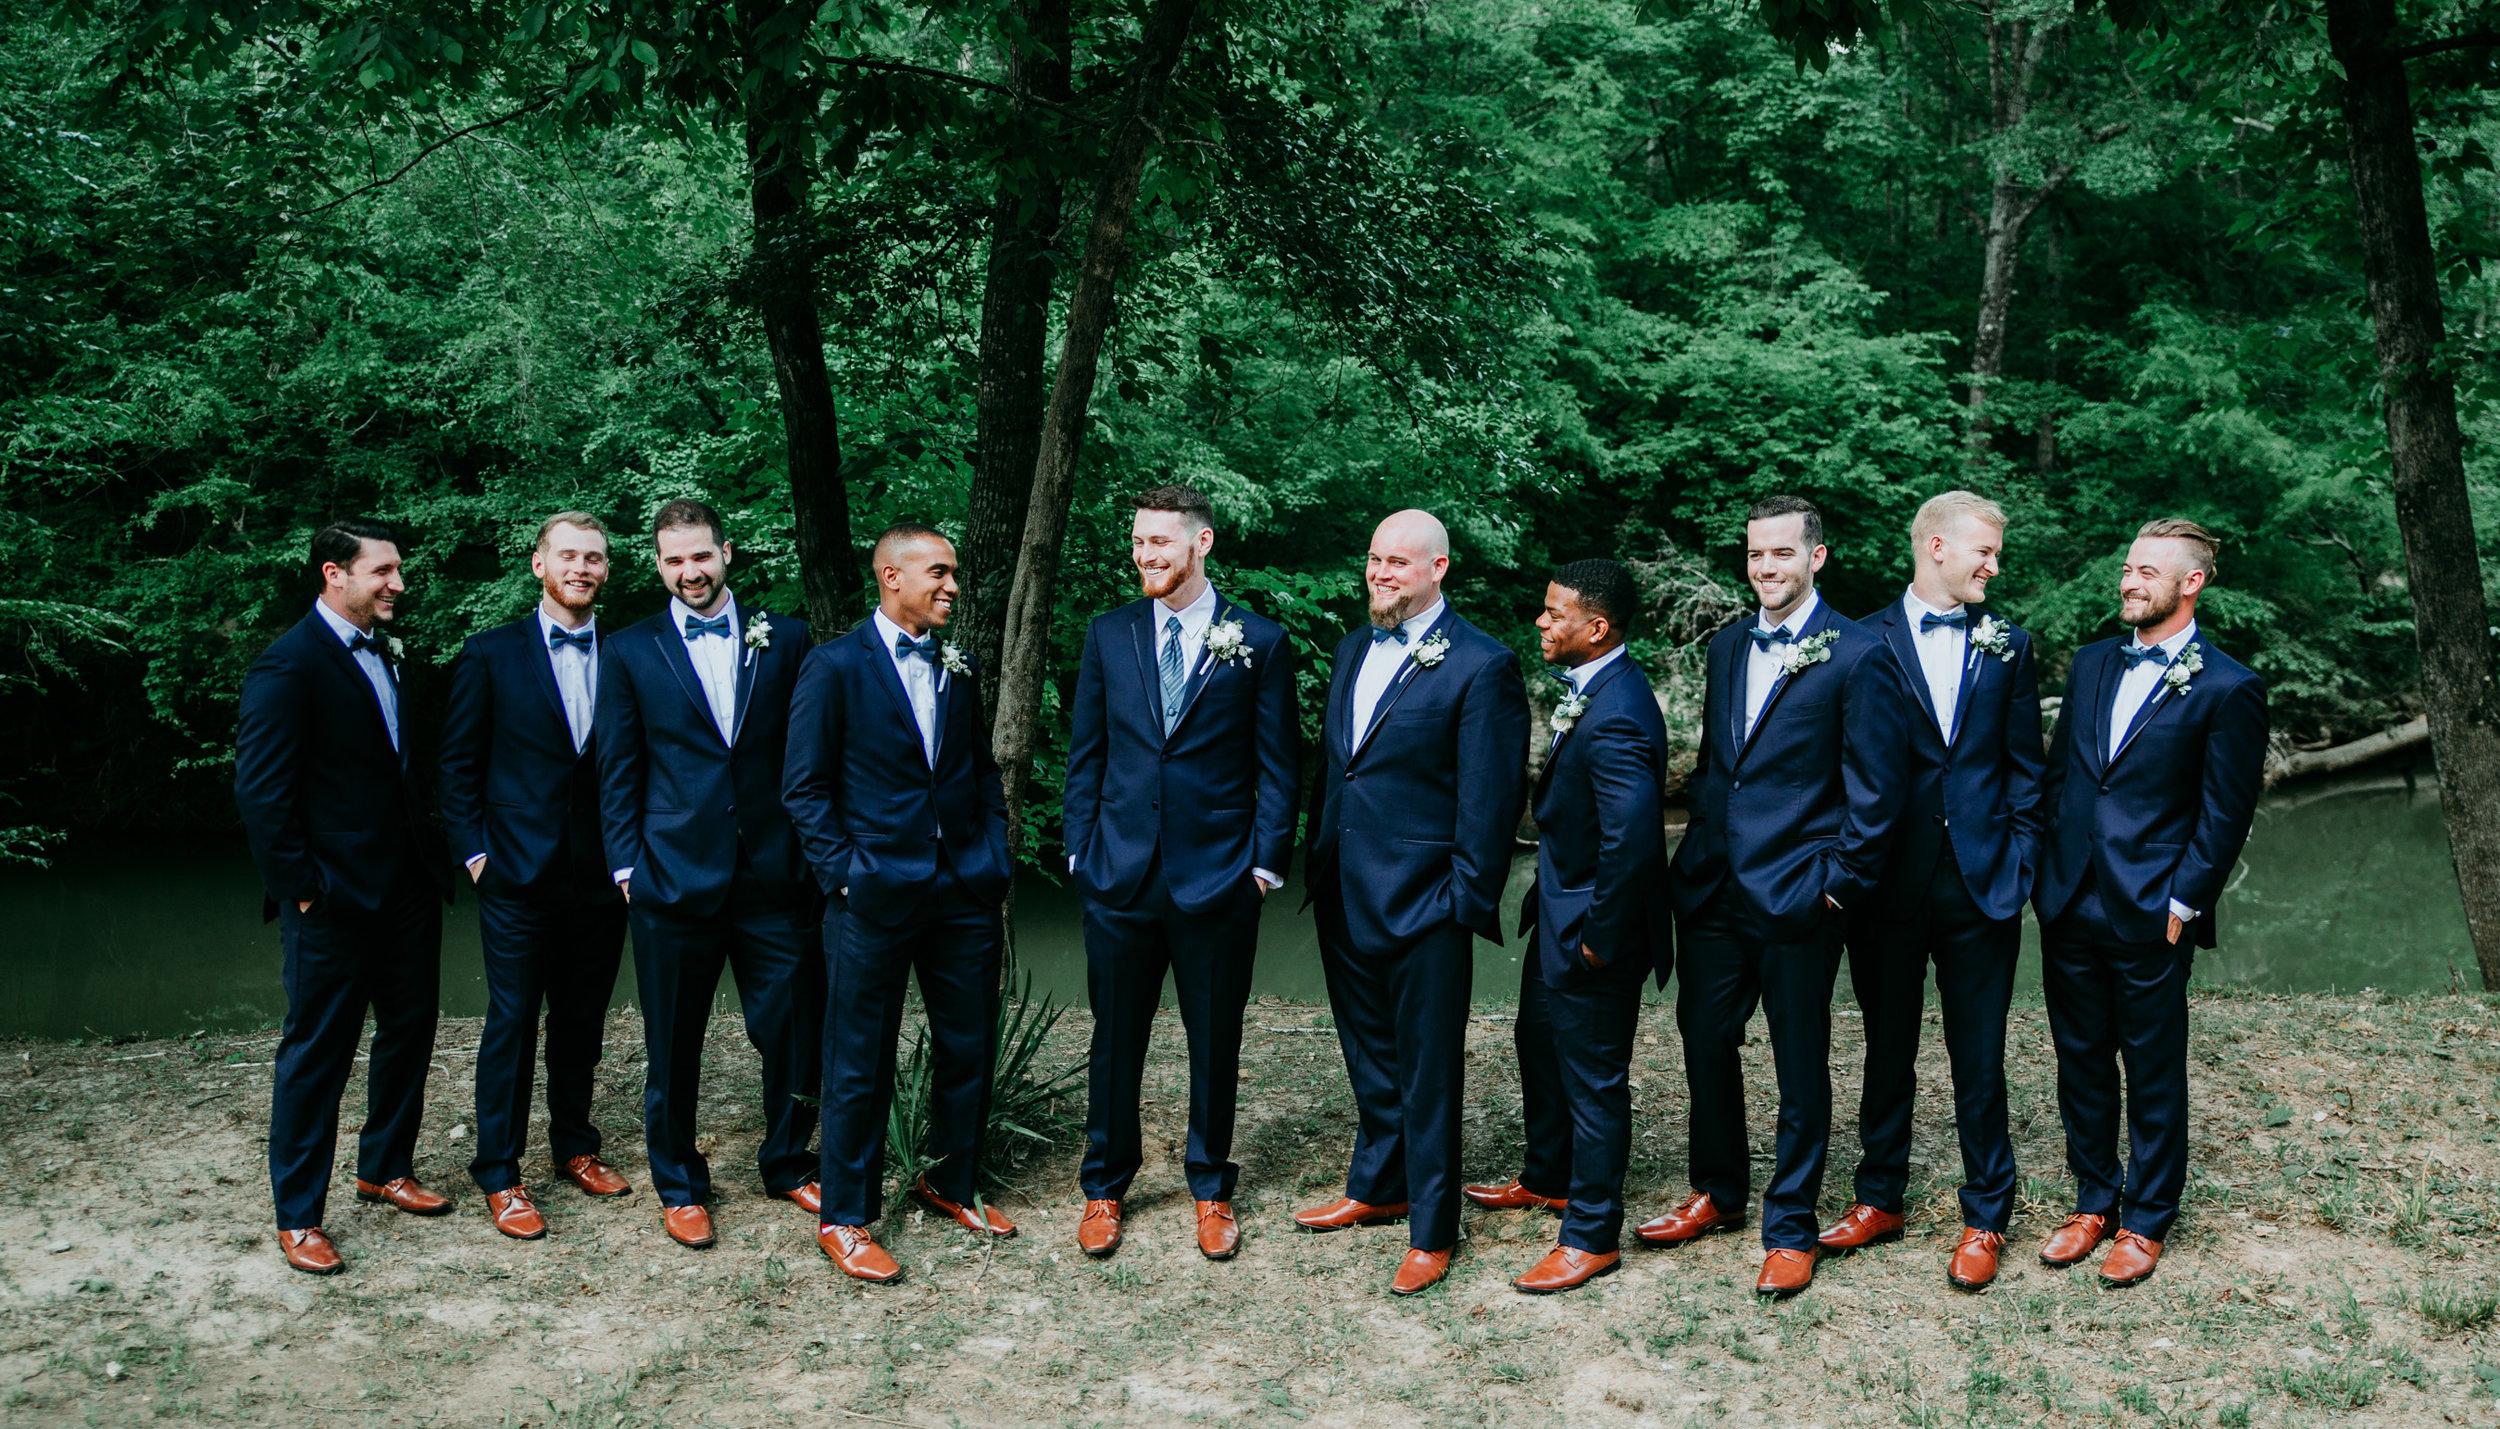 unique-groomsmen-photos.jpg